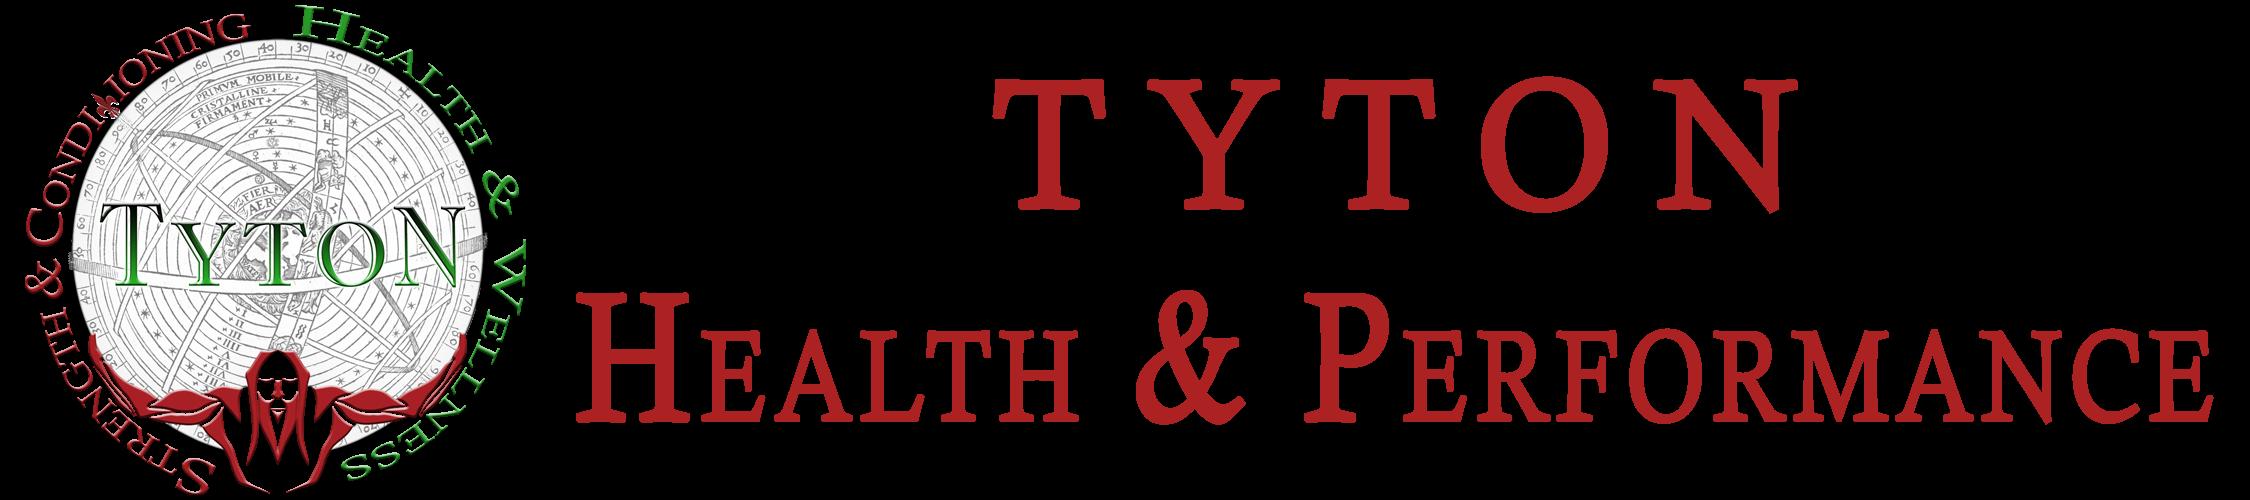 Tyton Health & Performance